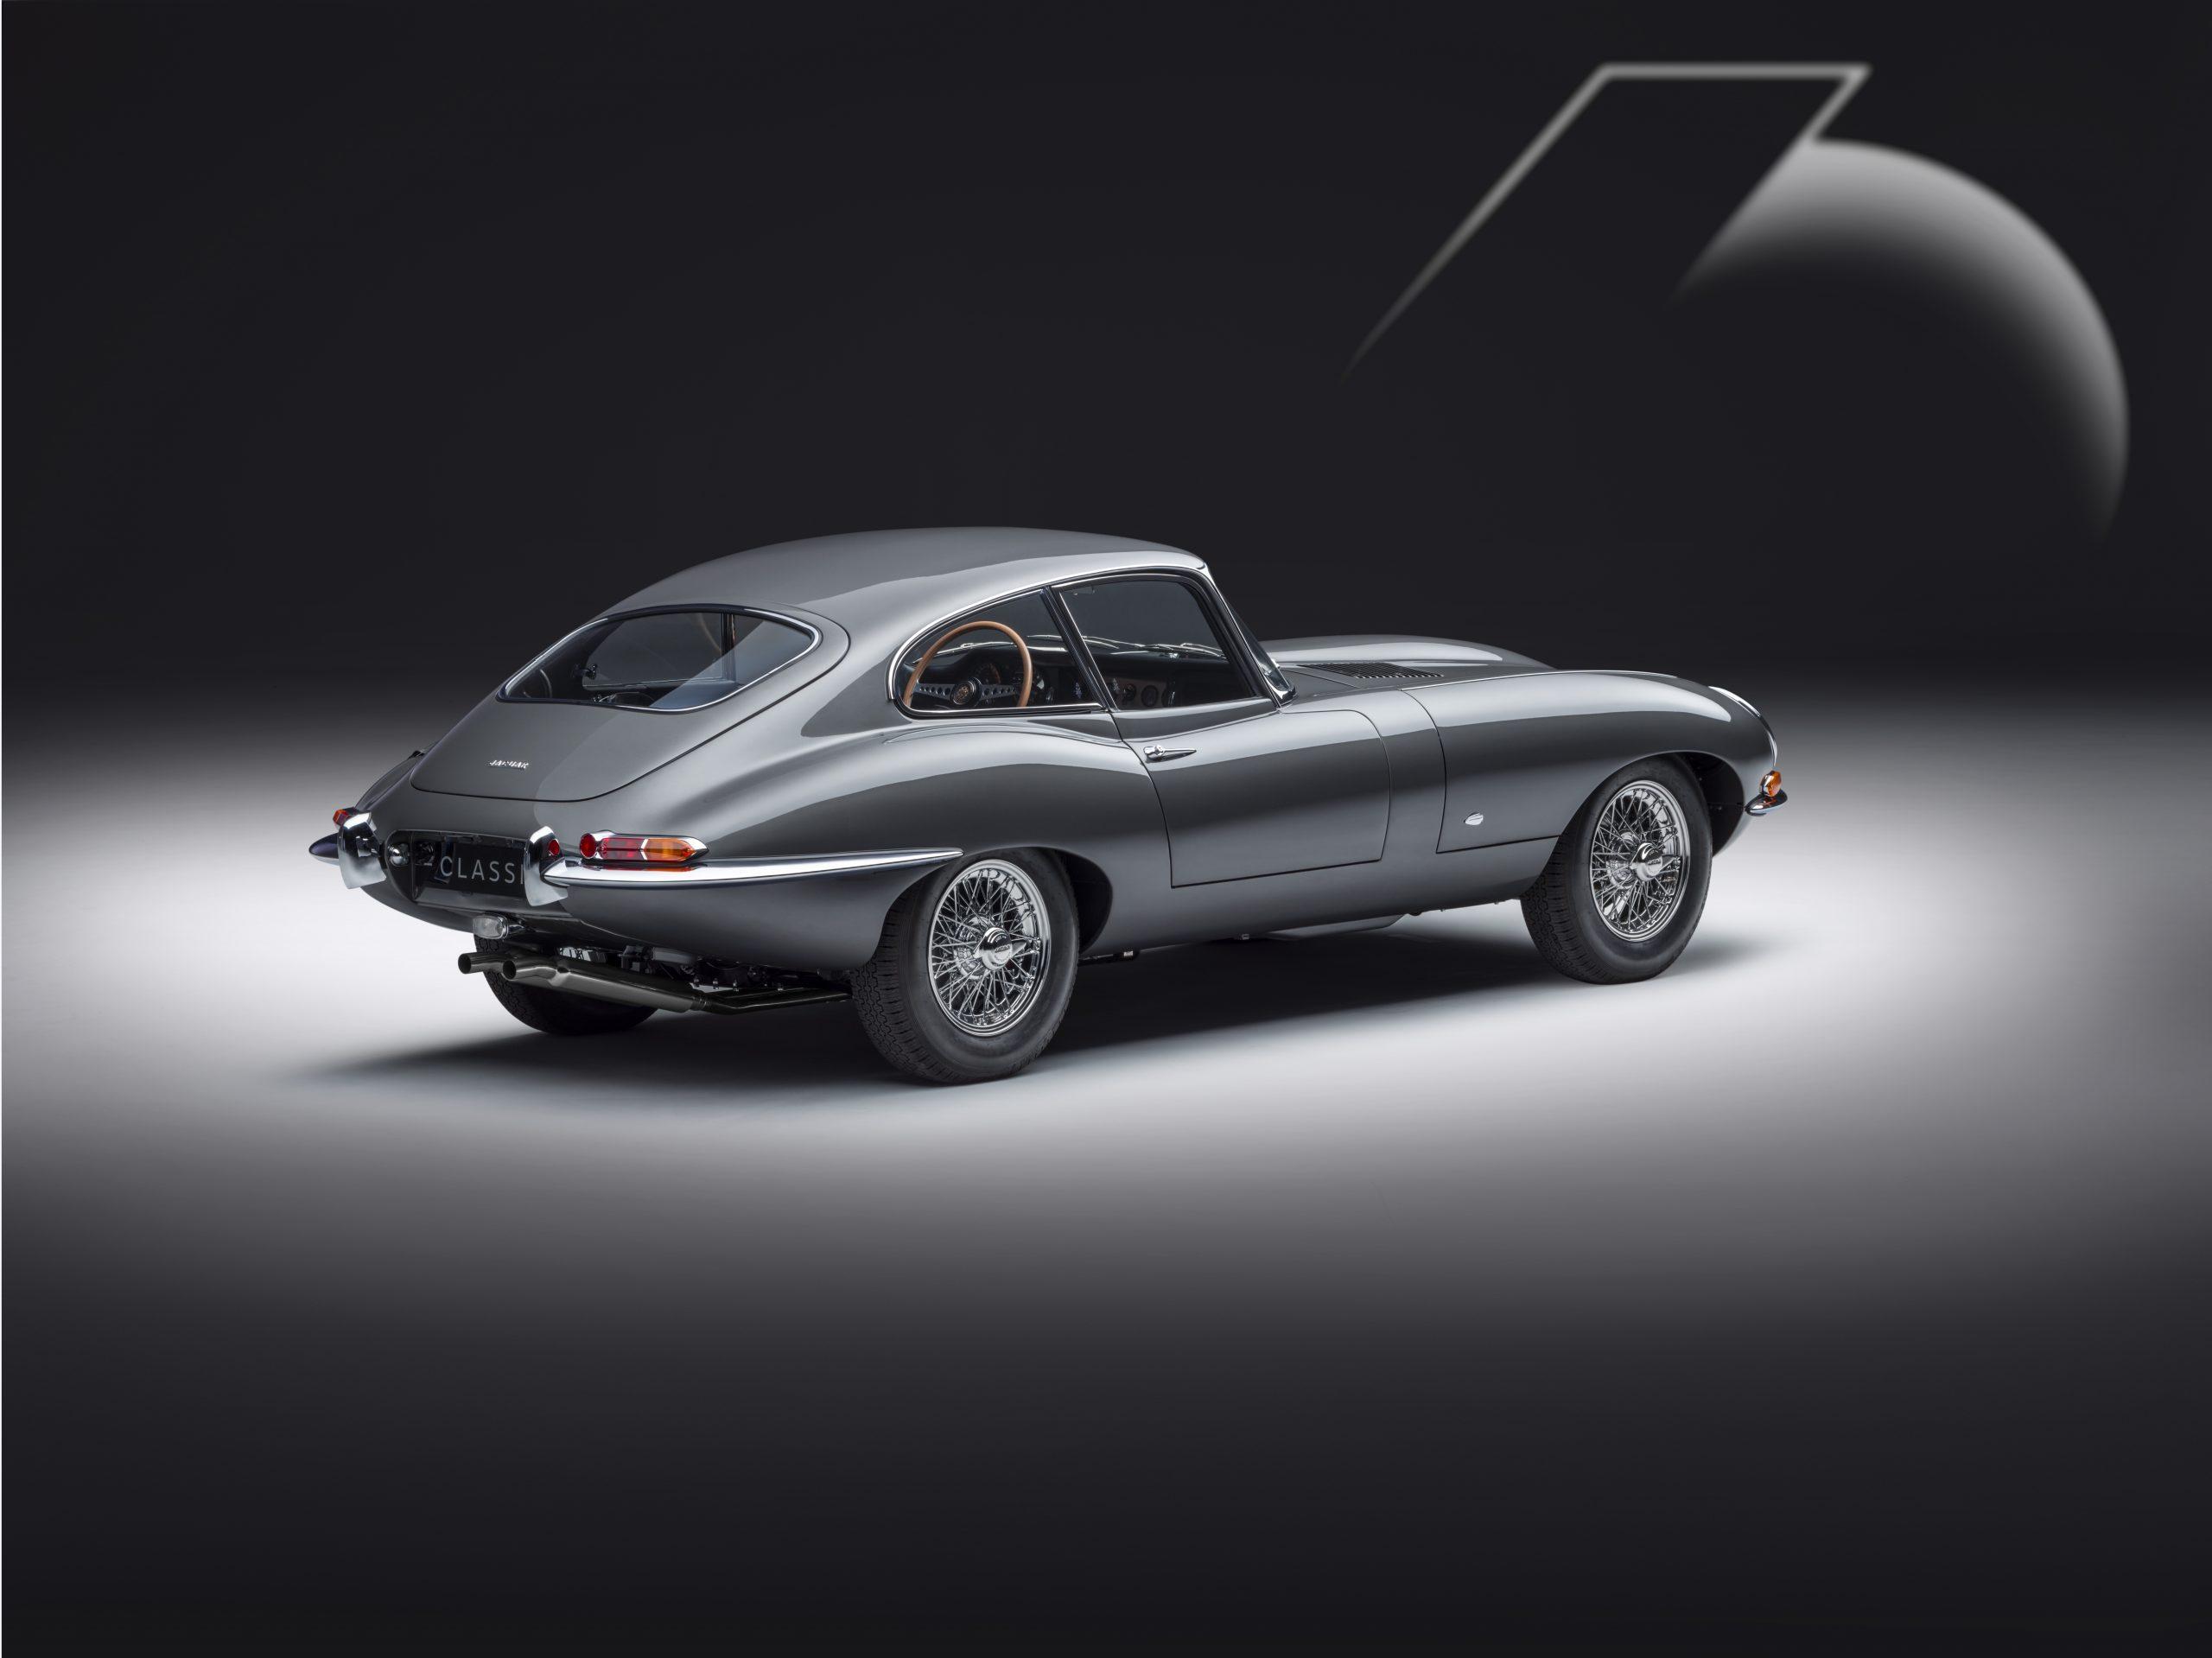 Jaguar Classic E-type 60